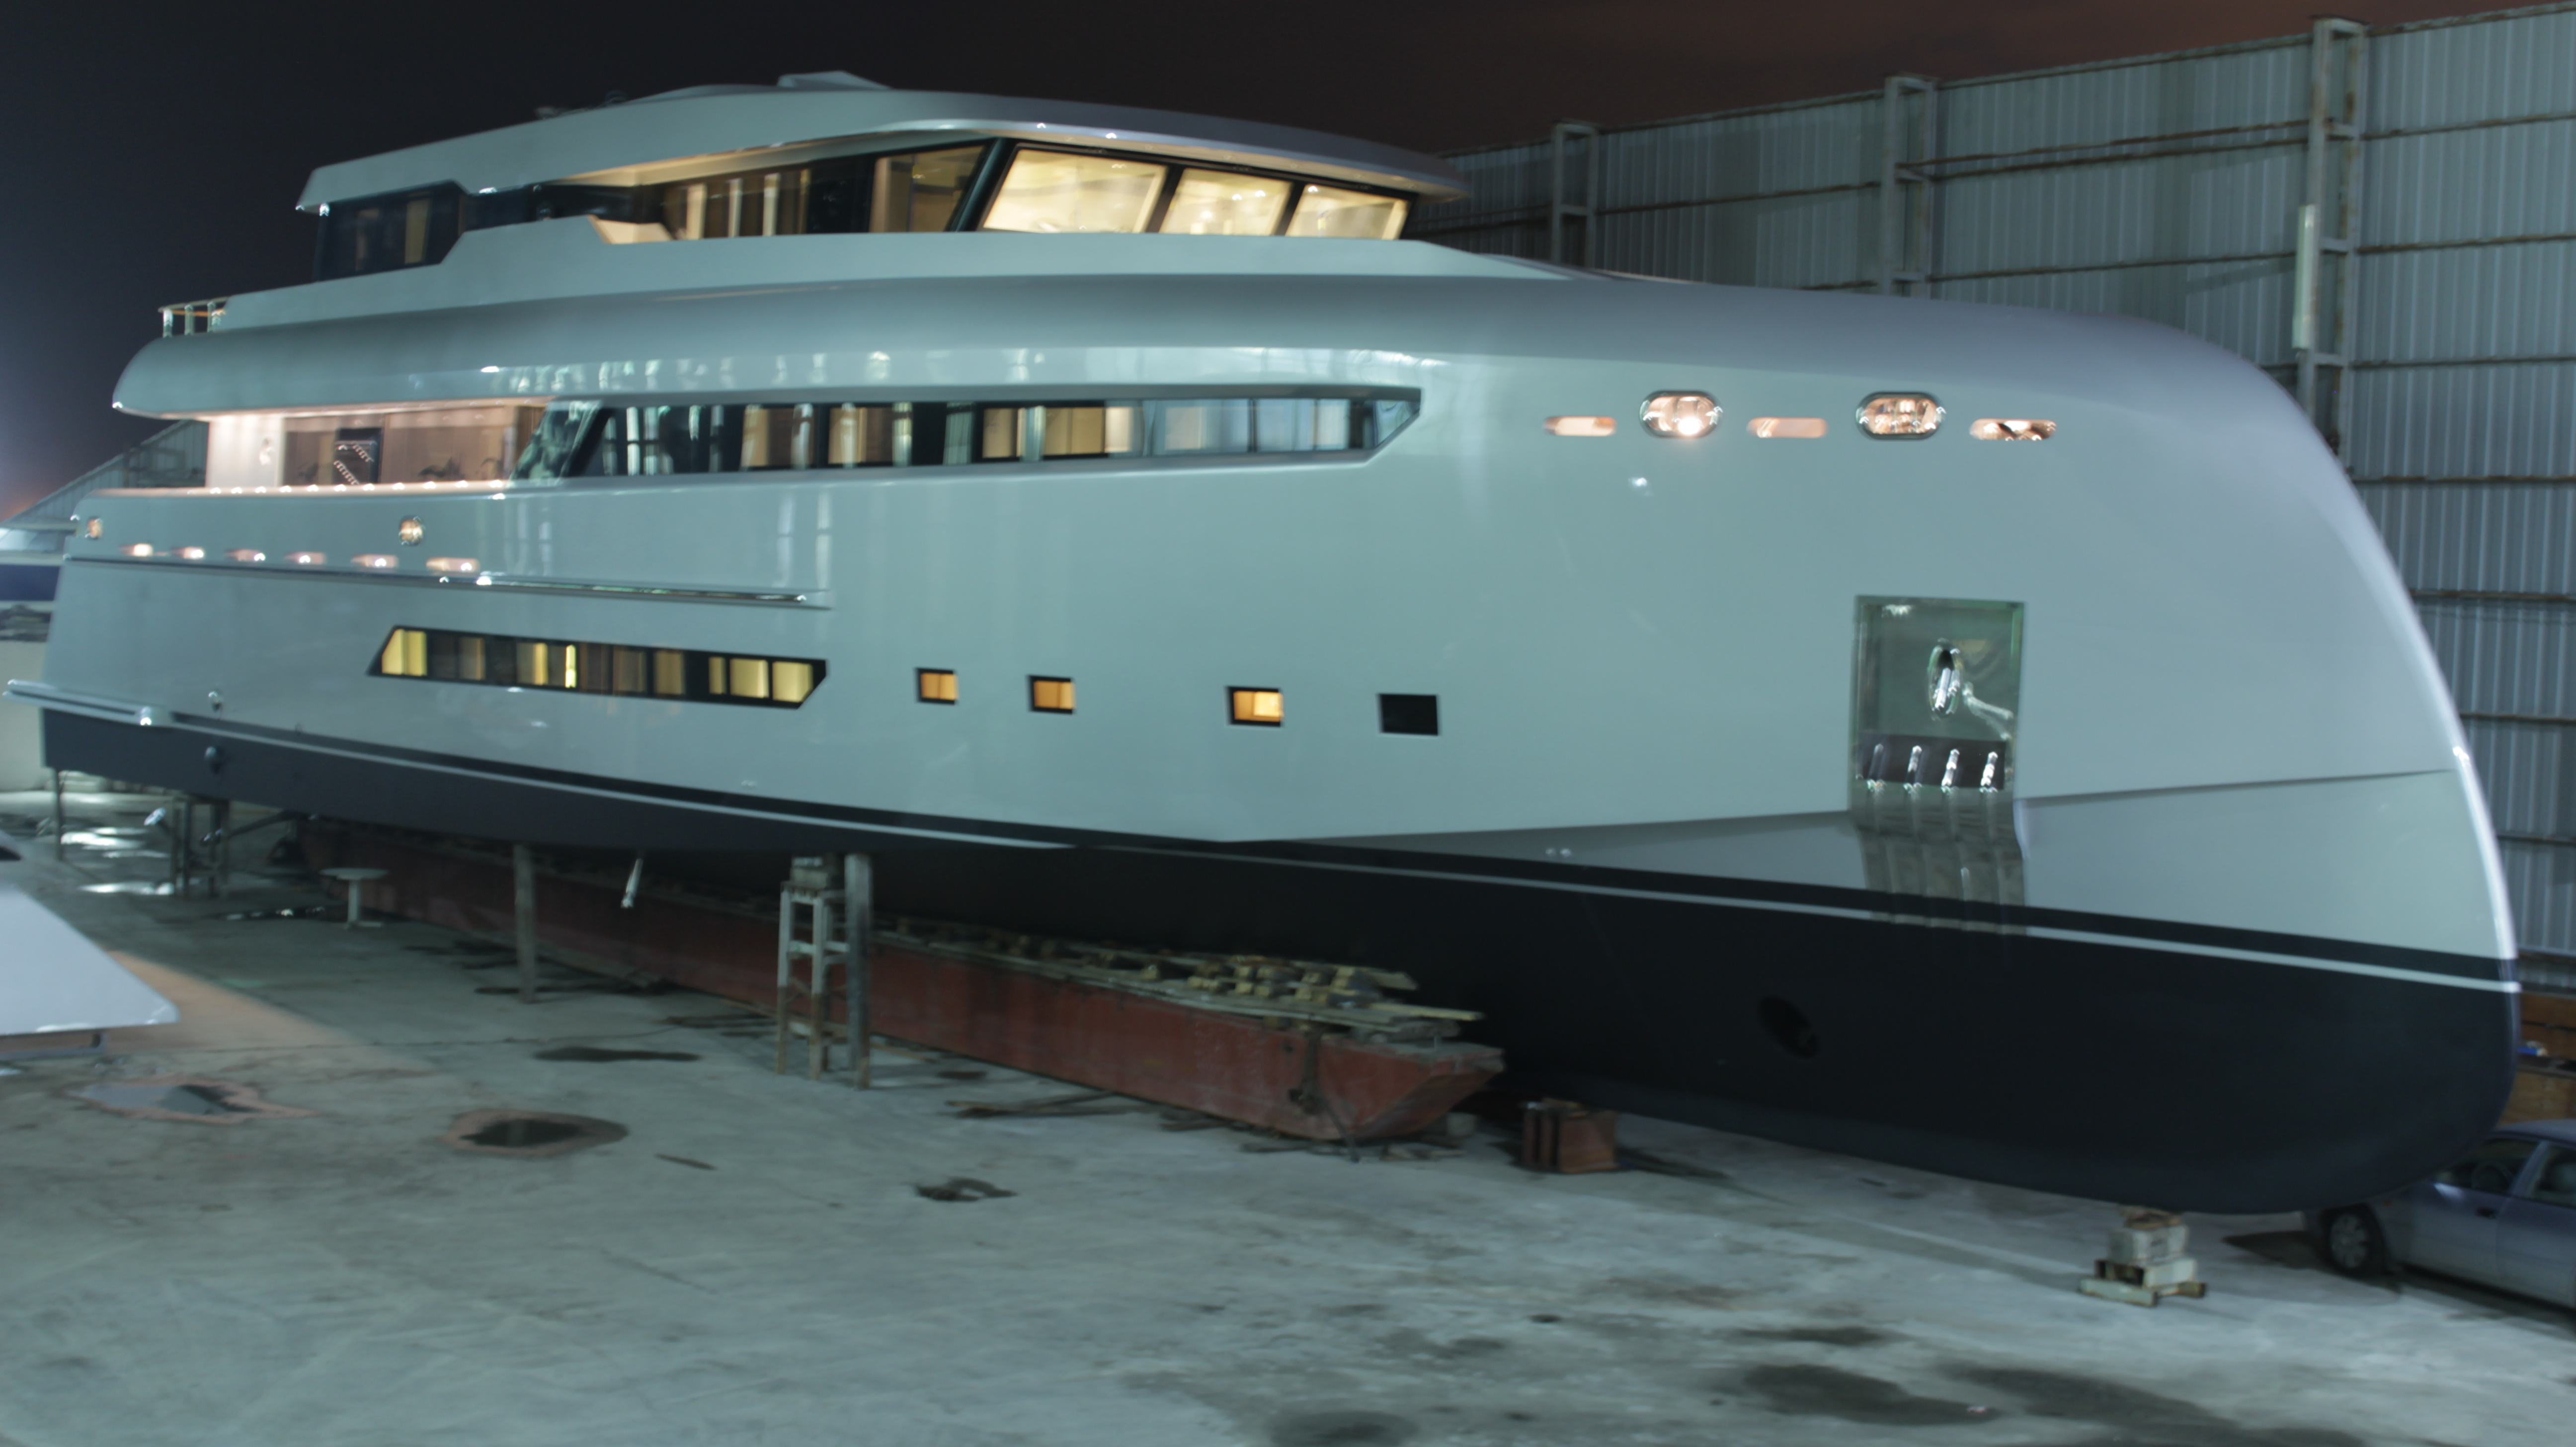 The striking 40m Project M Yacht by Bilgin Yacht designed by H2 Design